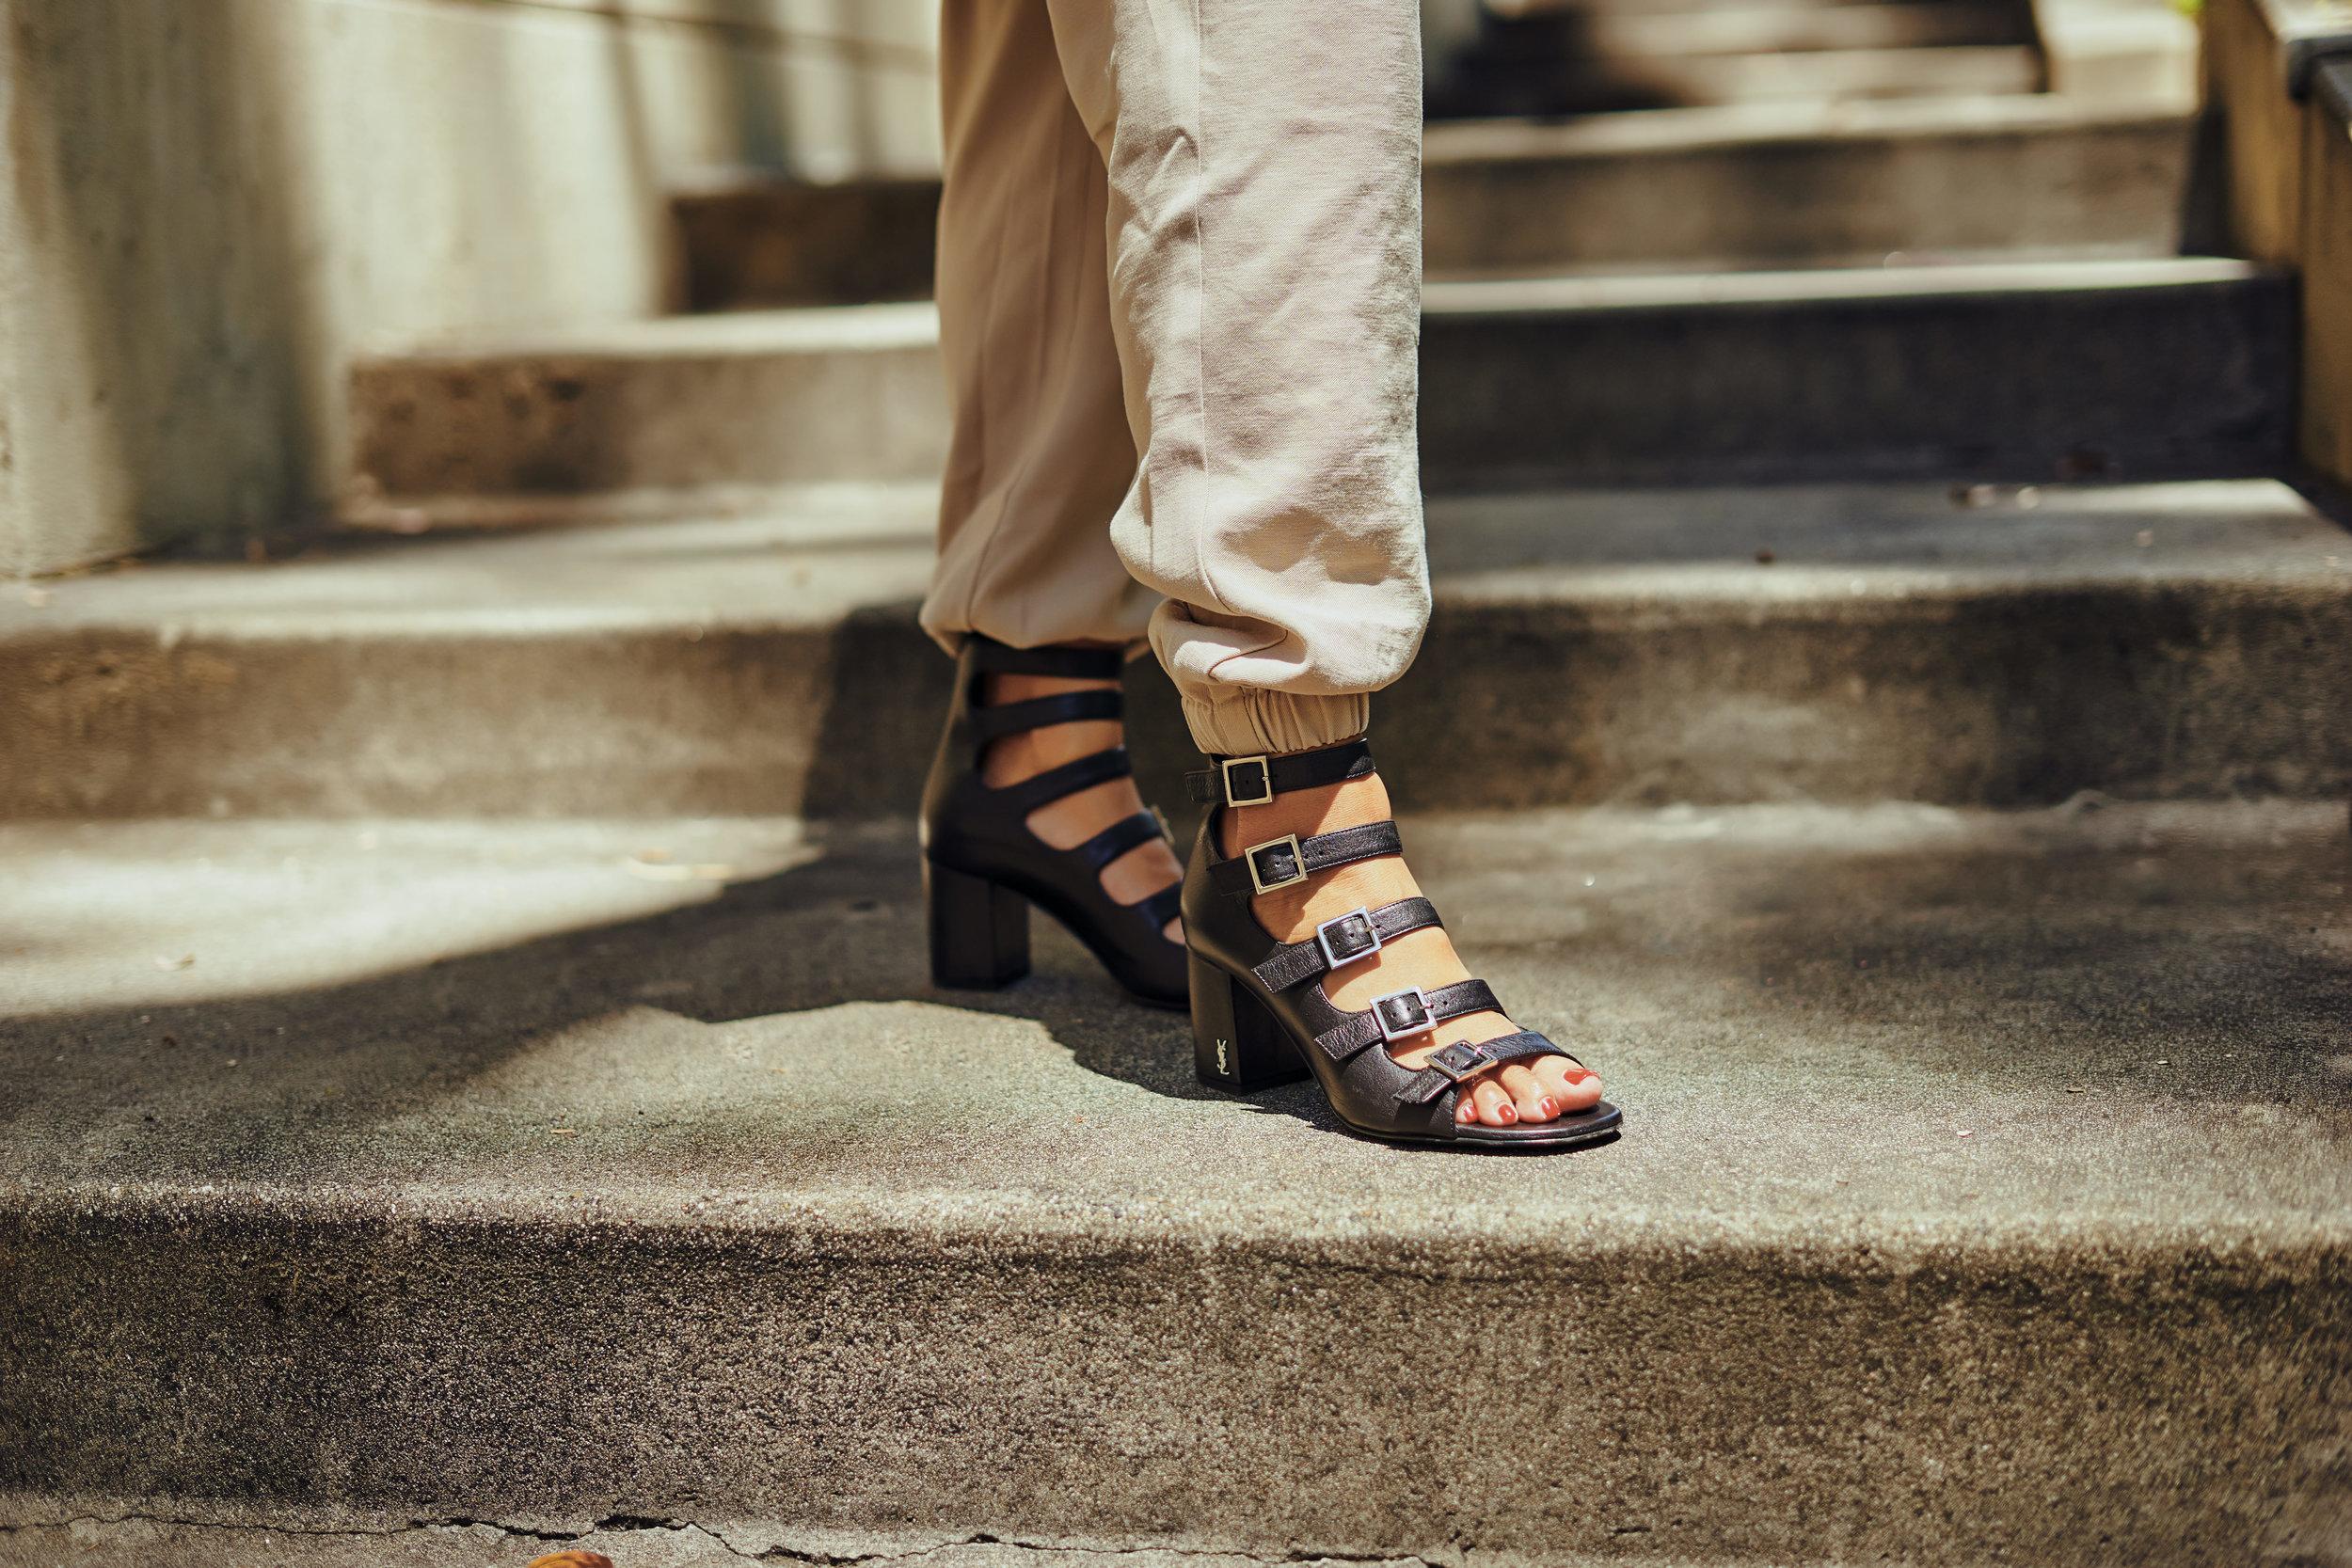 L'Academie jumpsuit  |  bonnie clyde shades  | ysl heels |  photos by sean martin